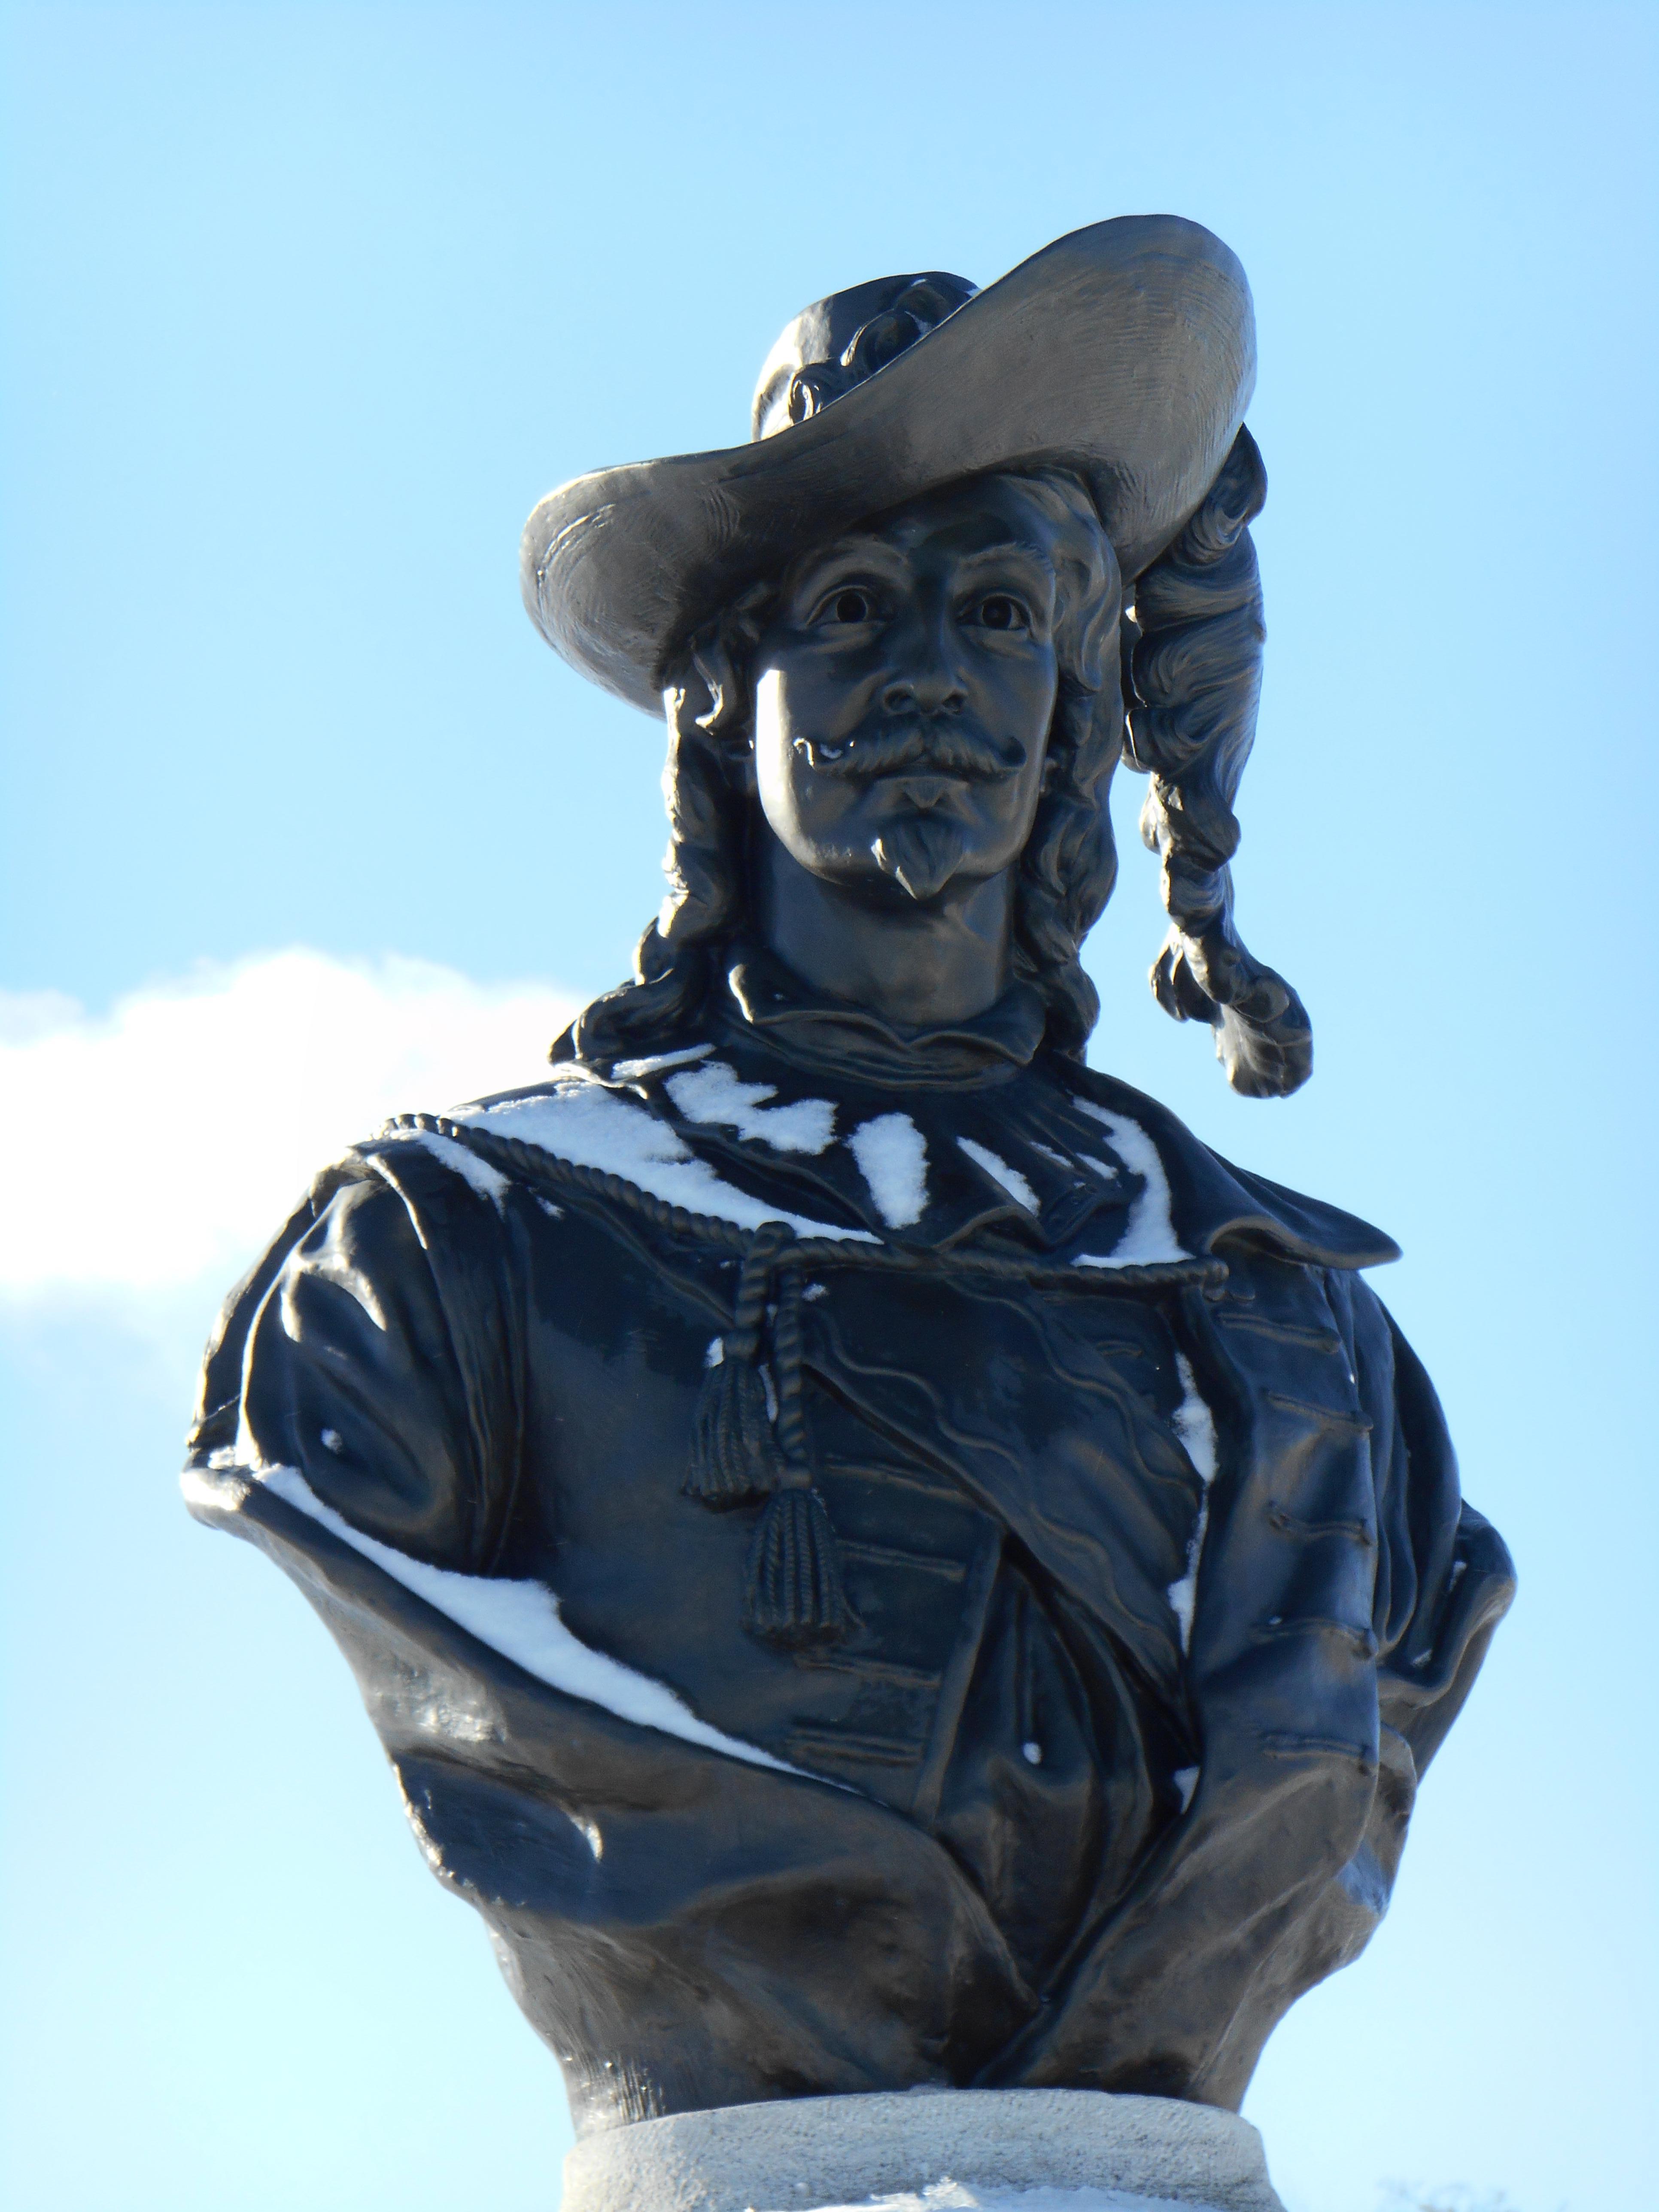 File:Monument de Pierre Du Gua de Monts 04.JPG - Wikimedia